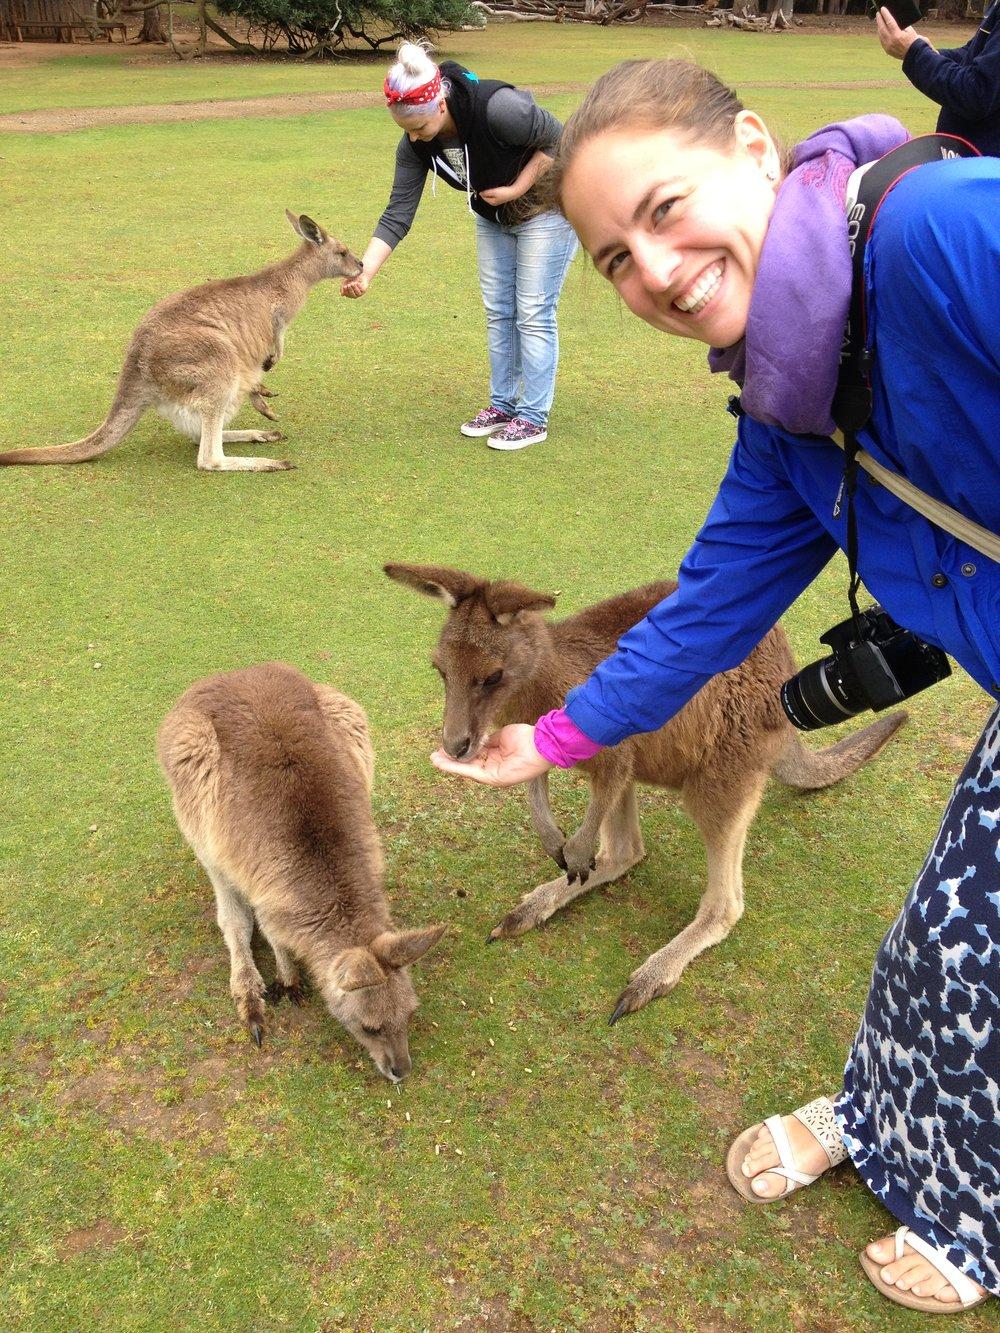 Feeding Kangaroos in Tasmania